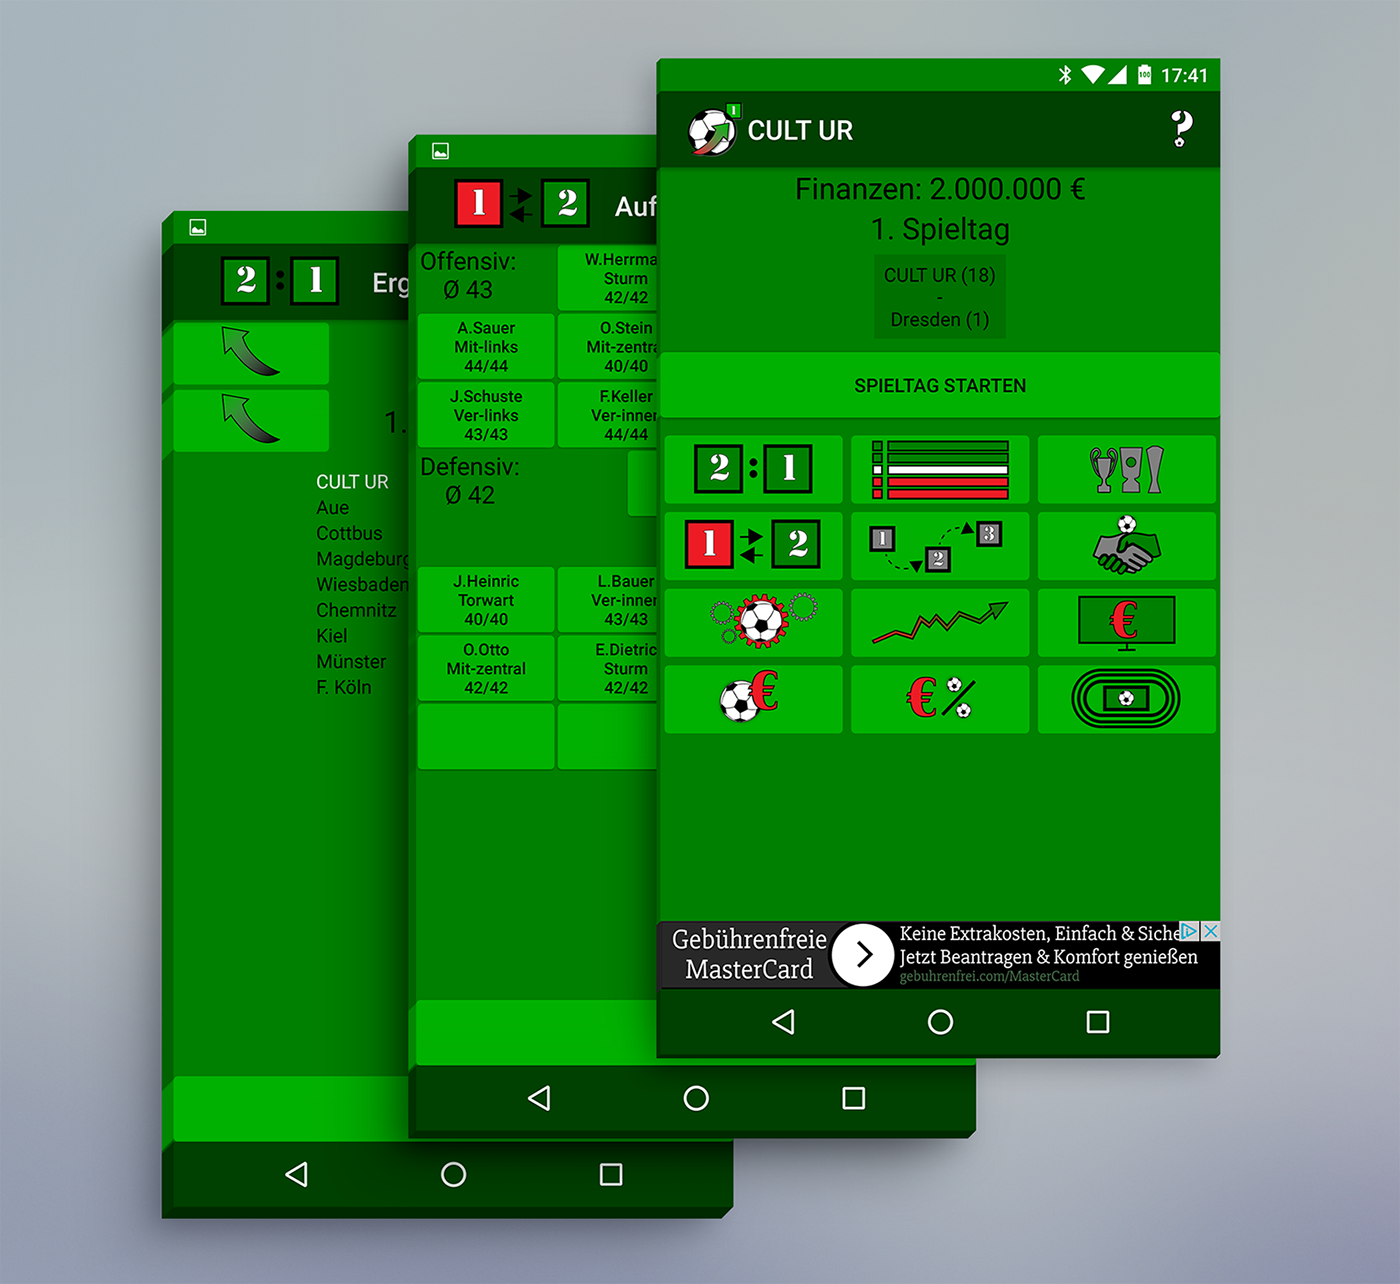 Aufstieg Fussball Manager App Logo Grafik Design On